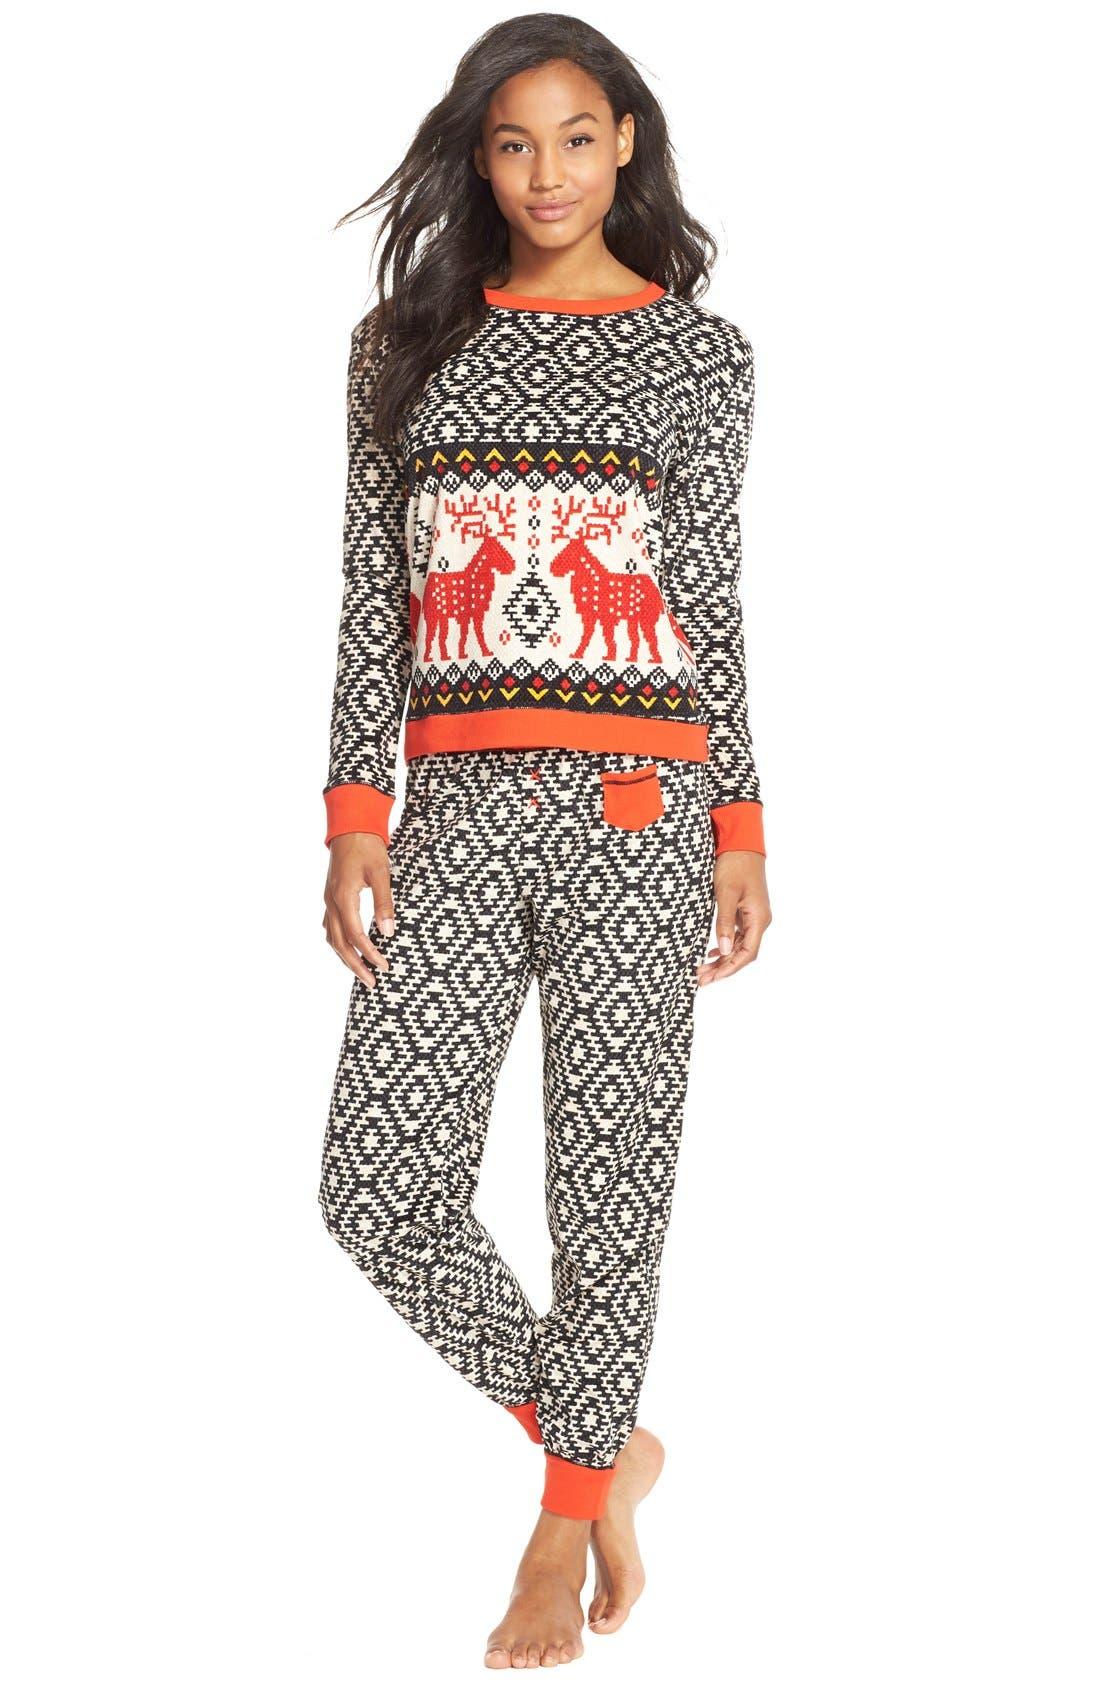 KENSIE 'ArcticChill' Knit Pajamas, Main, color, 015